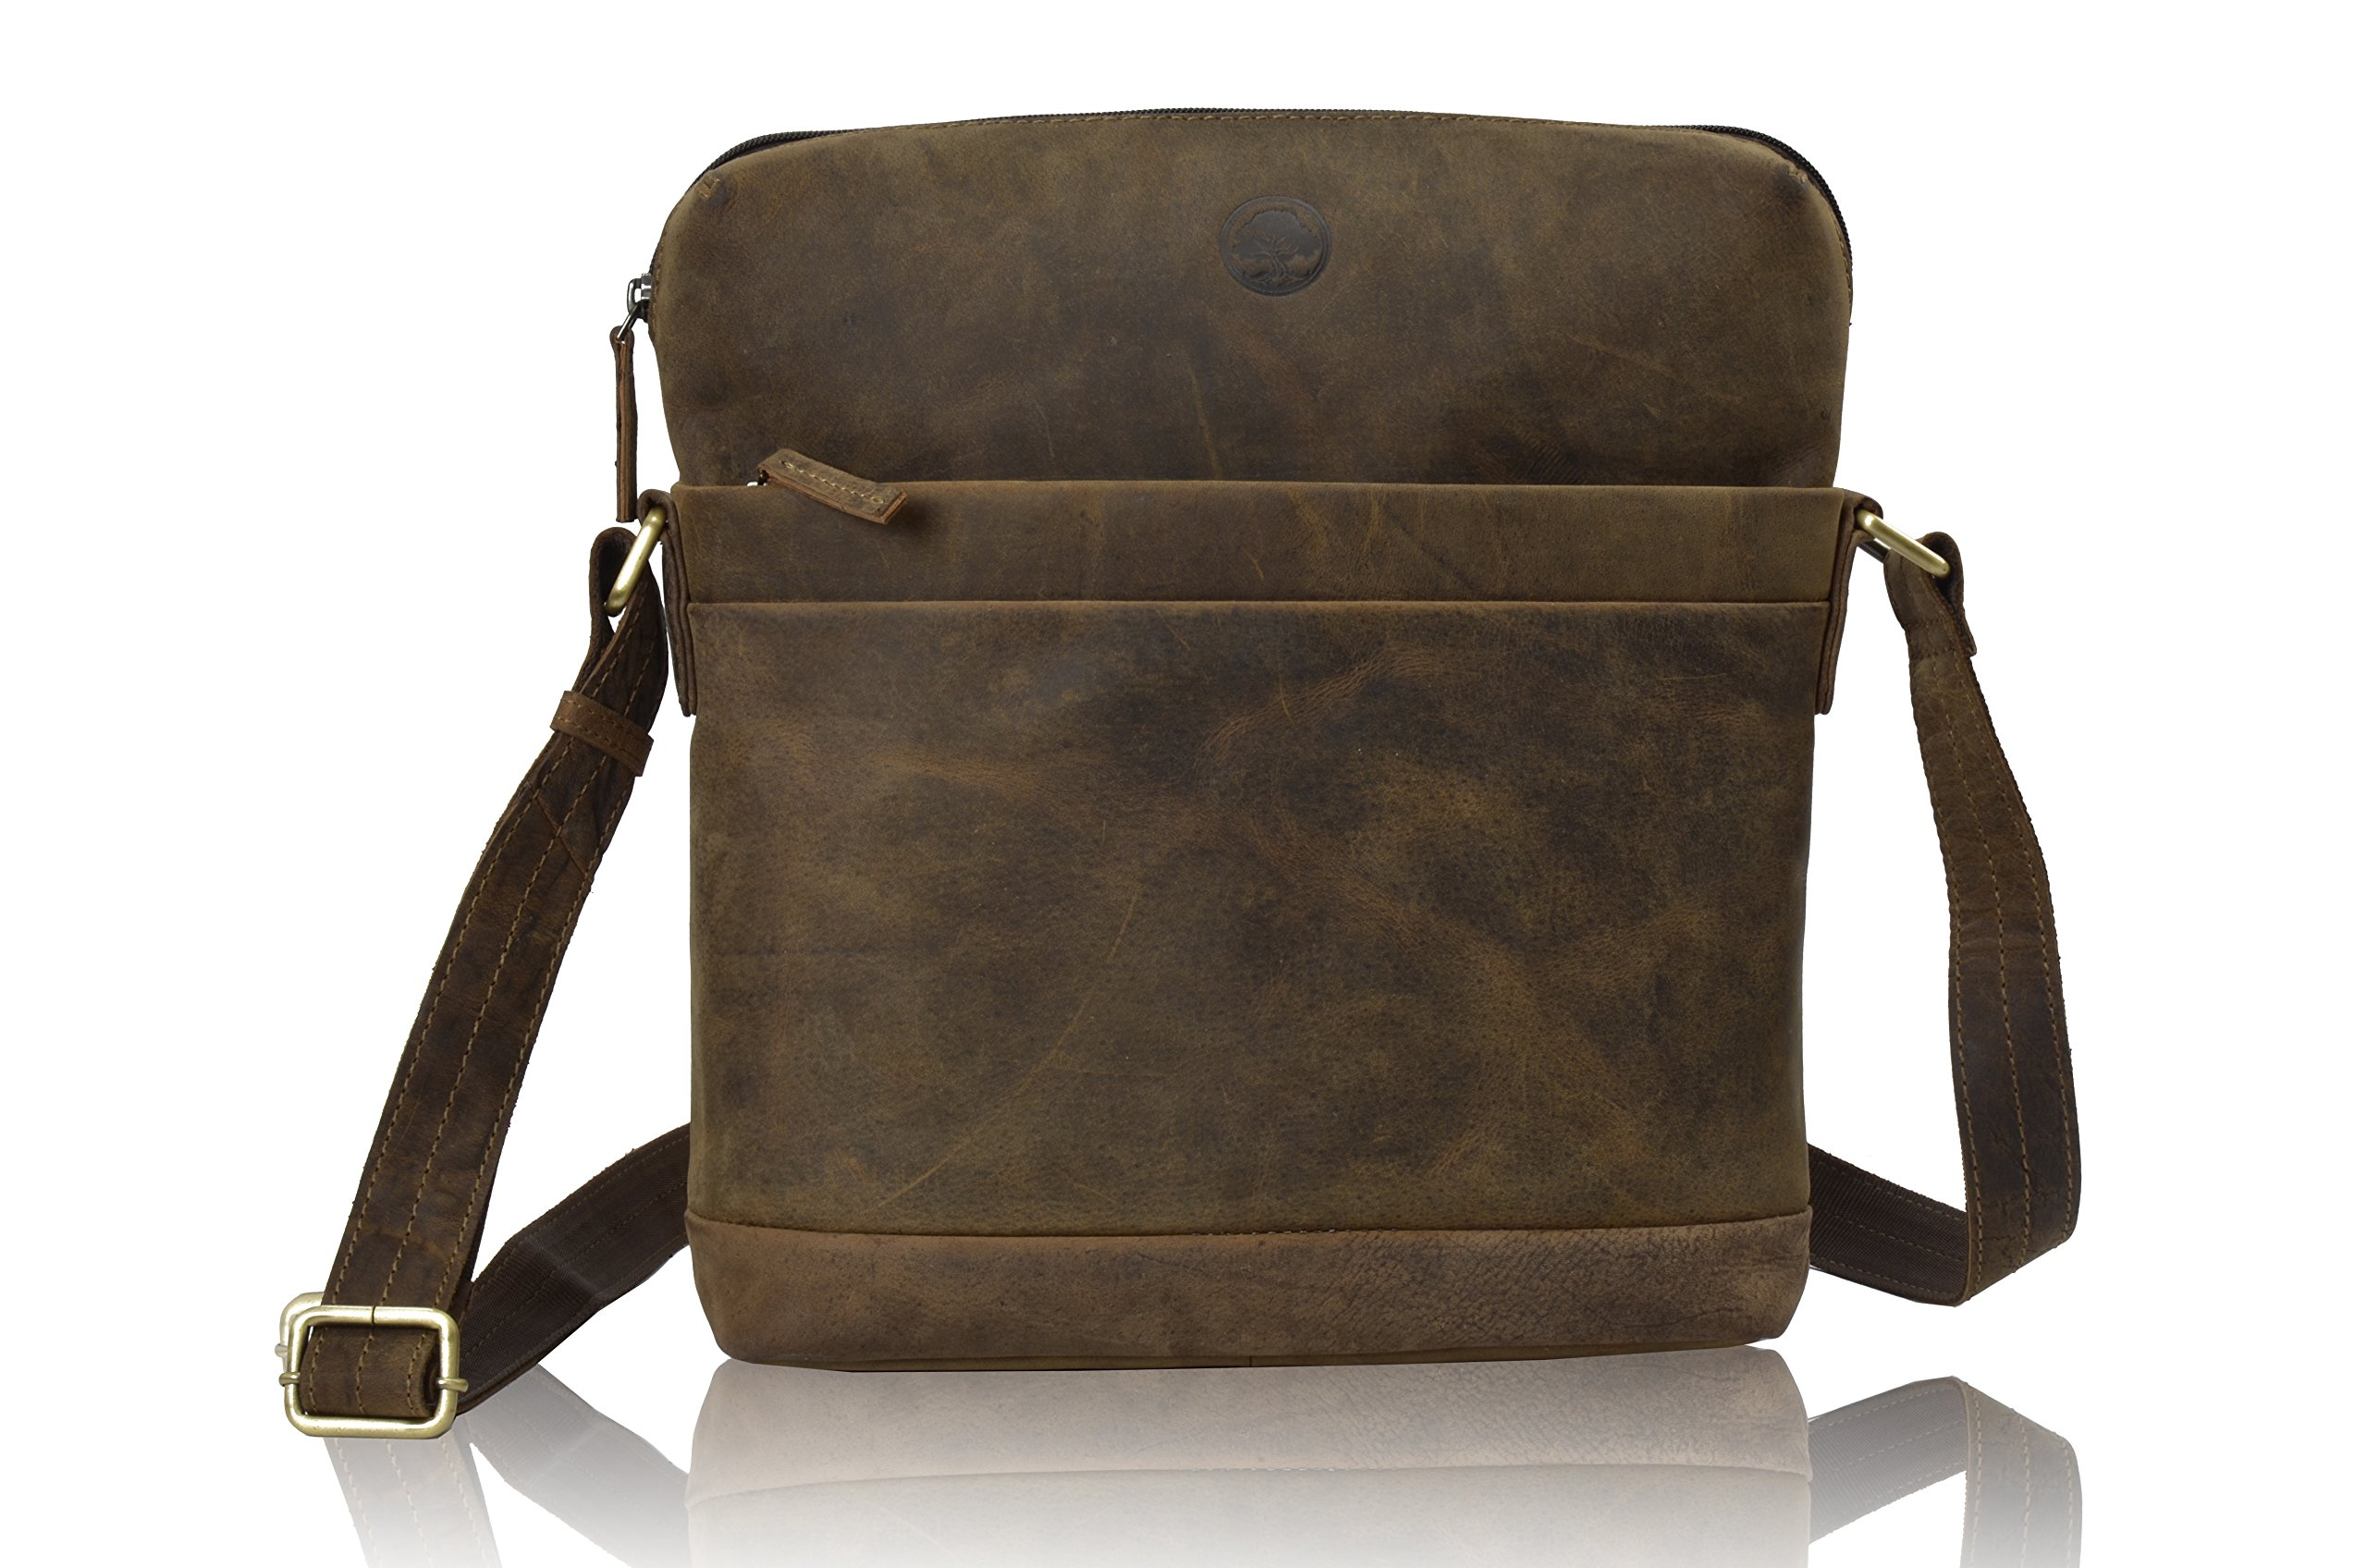 100% Natural Rustic Leather Satchel Bags in vintage